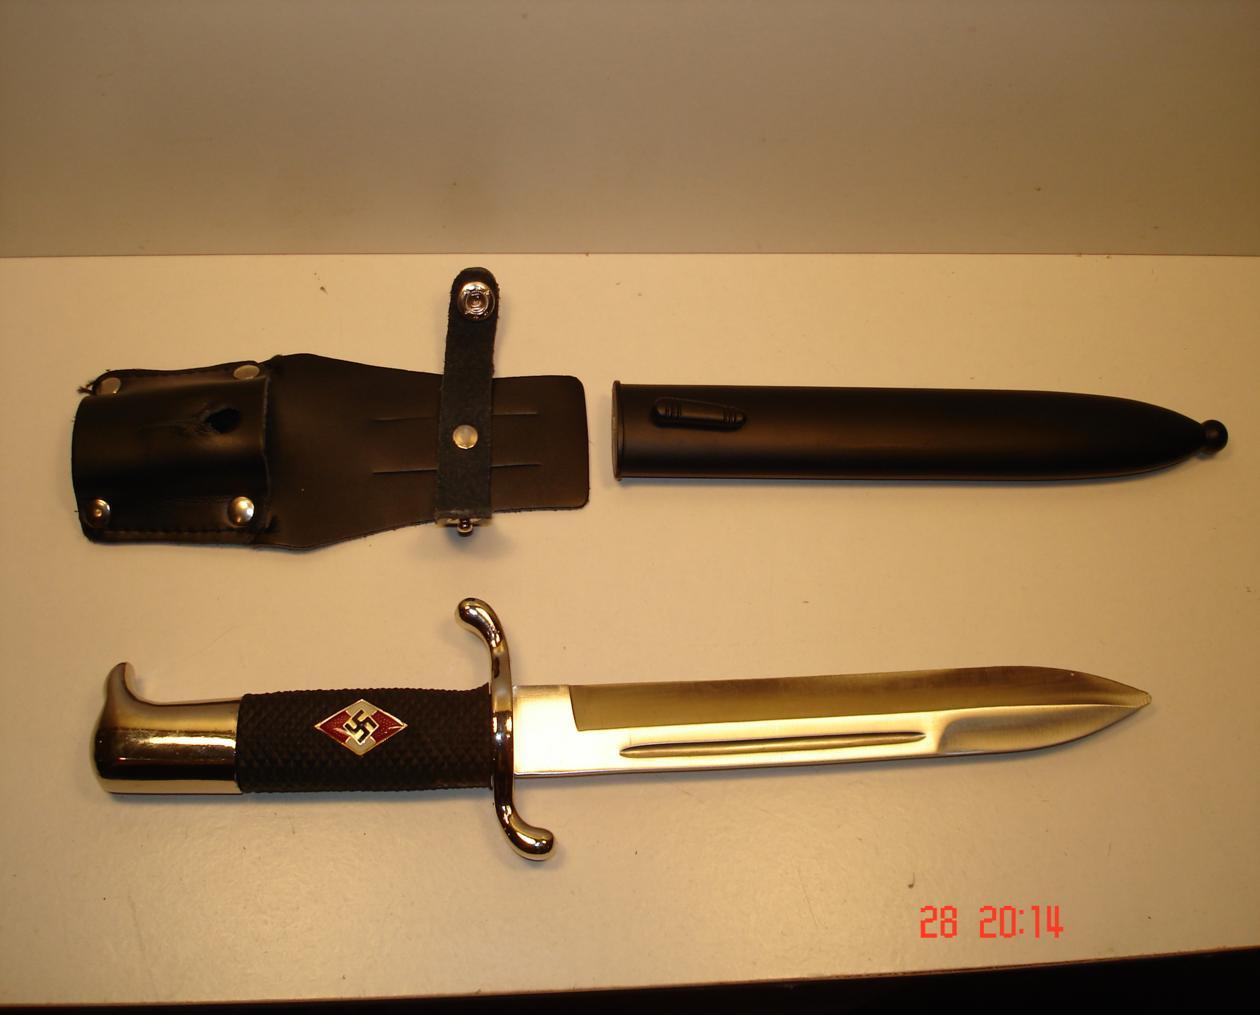 фото ножей 3 рейха